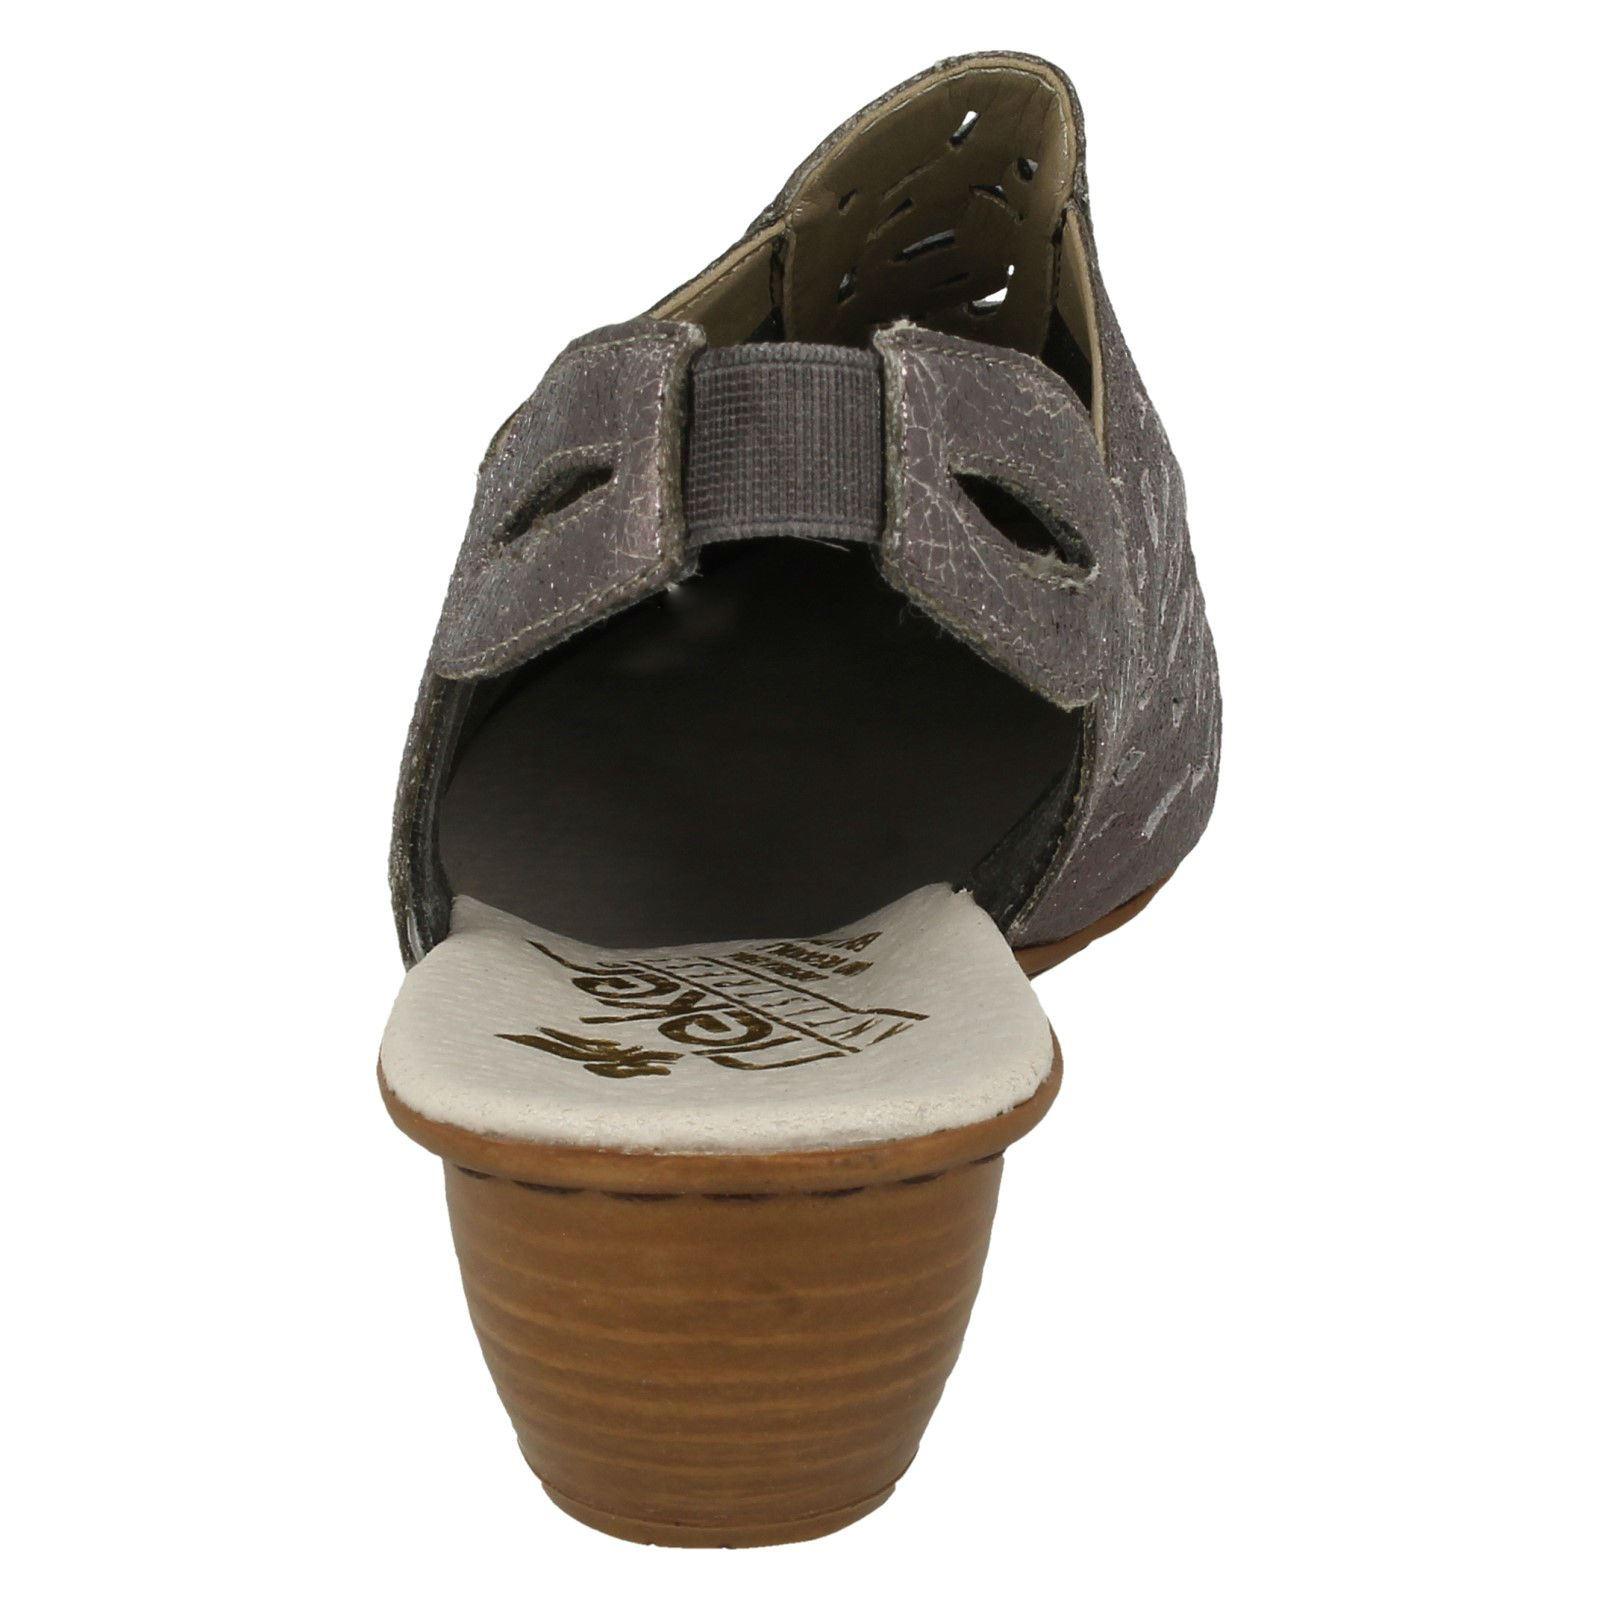 Slingback argento Rieker 43769 Shoes Metallic Heeled Ladies xpqgwP